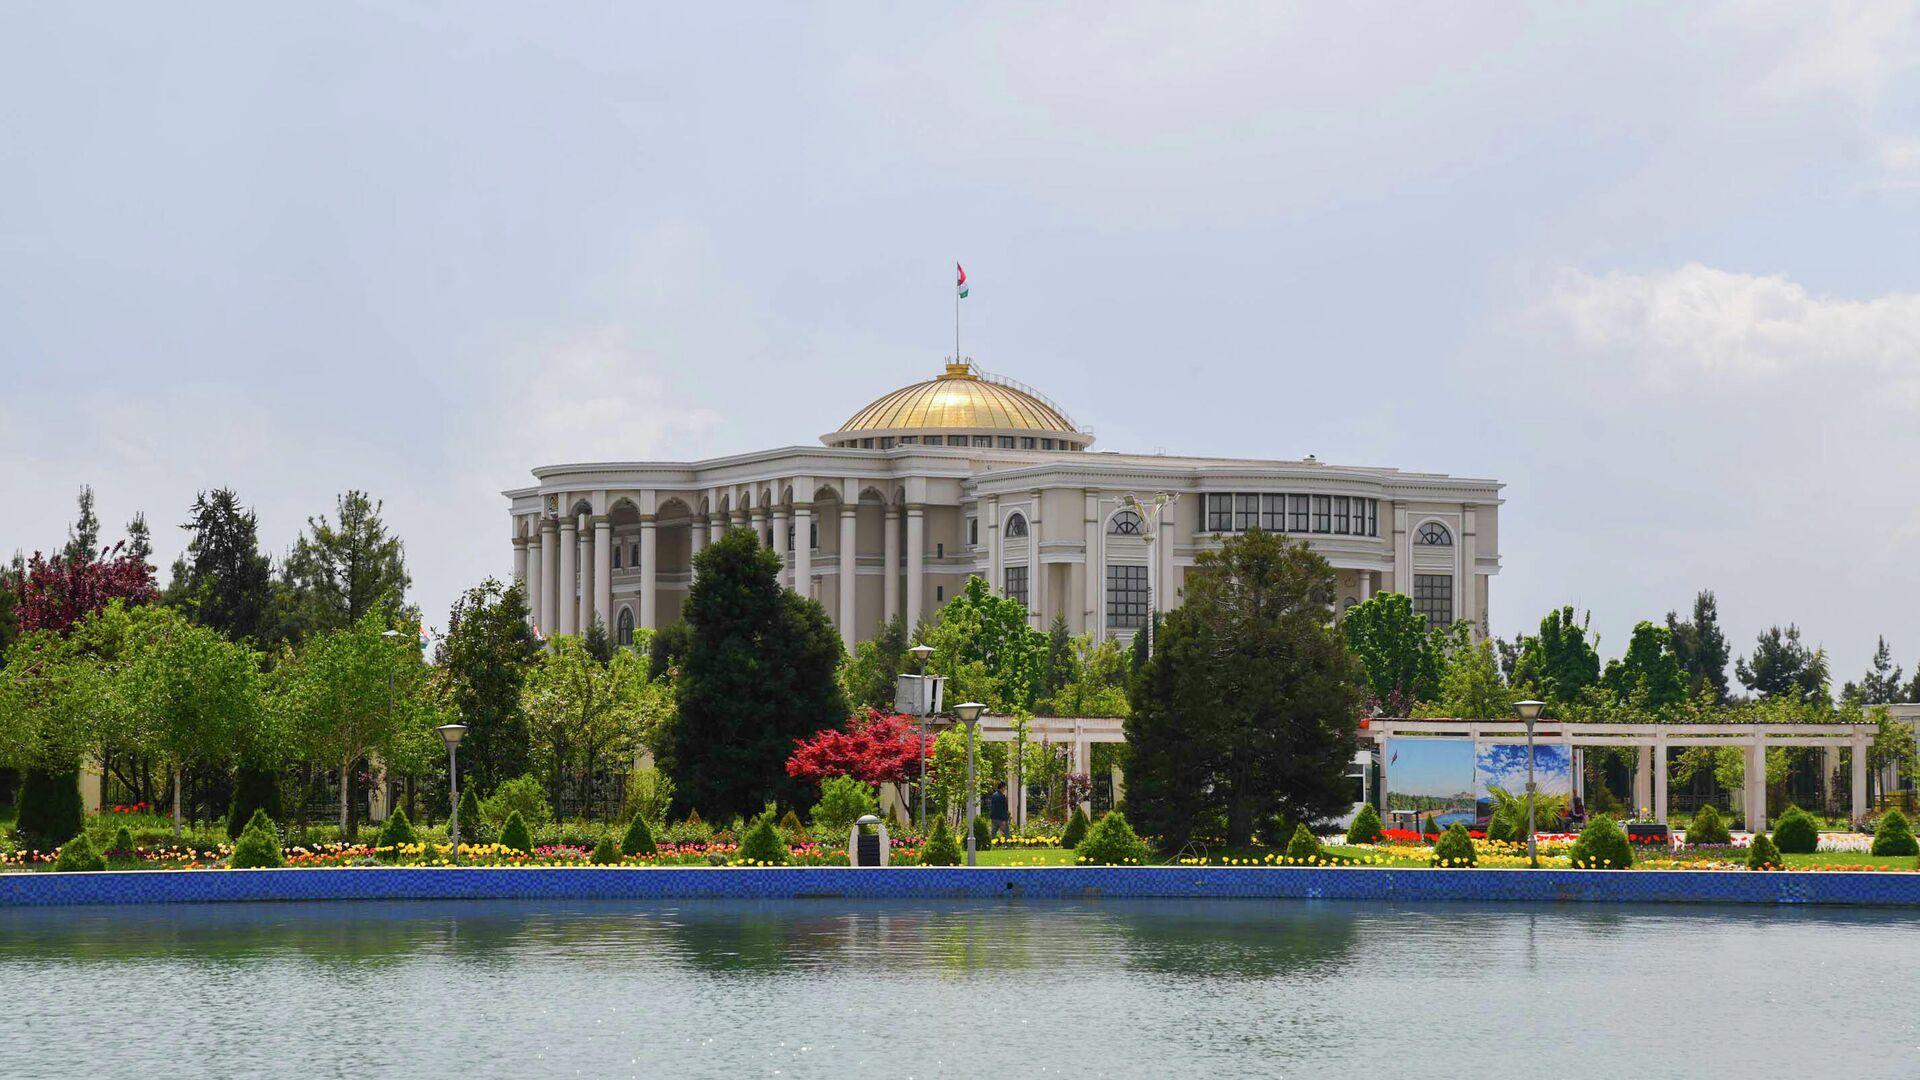 Дворец нации в Душанбе - Sputnik Тоҷикистон, 1920, 24.04.2021